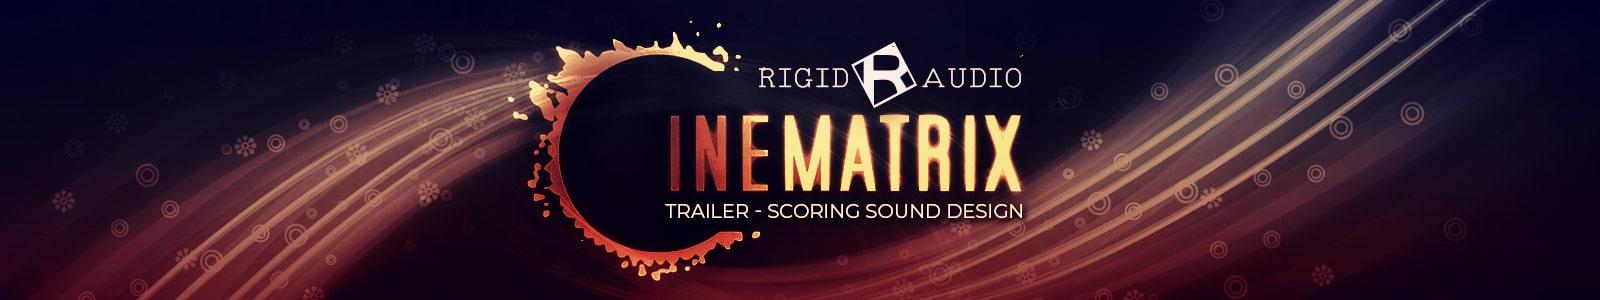 cinematrix by rigid audio